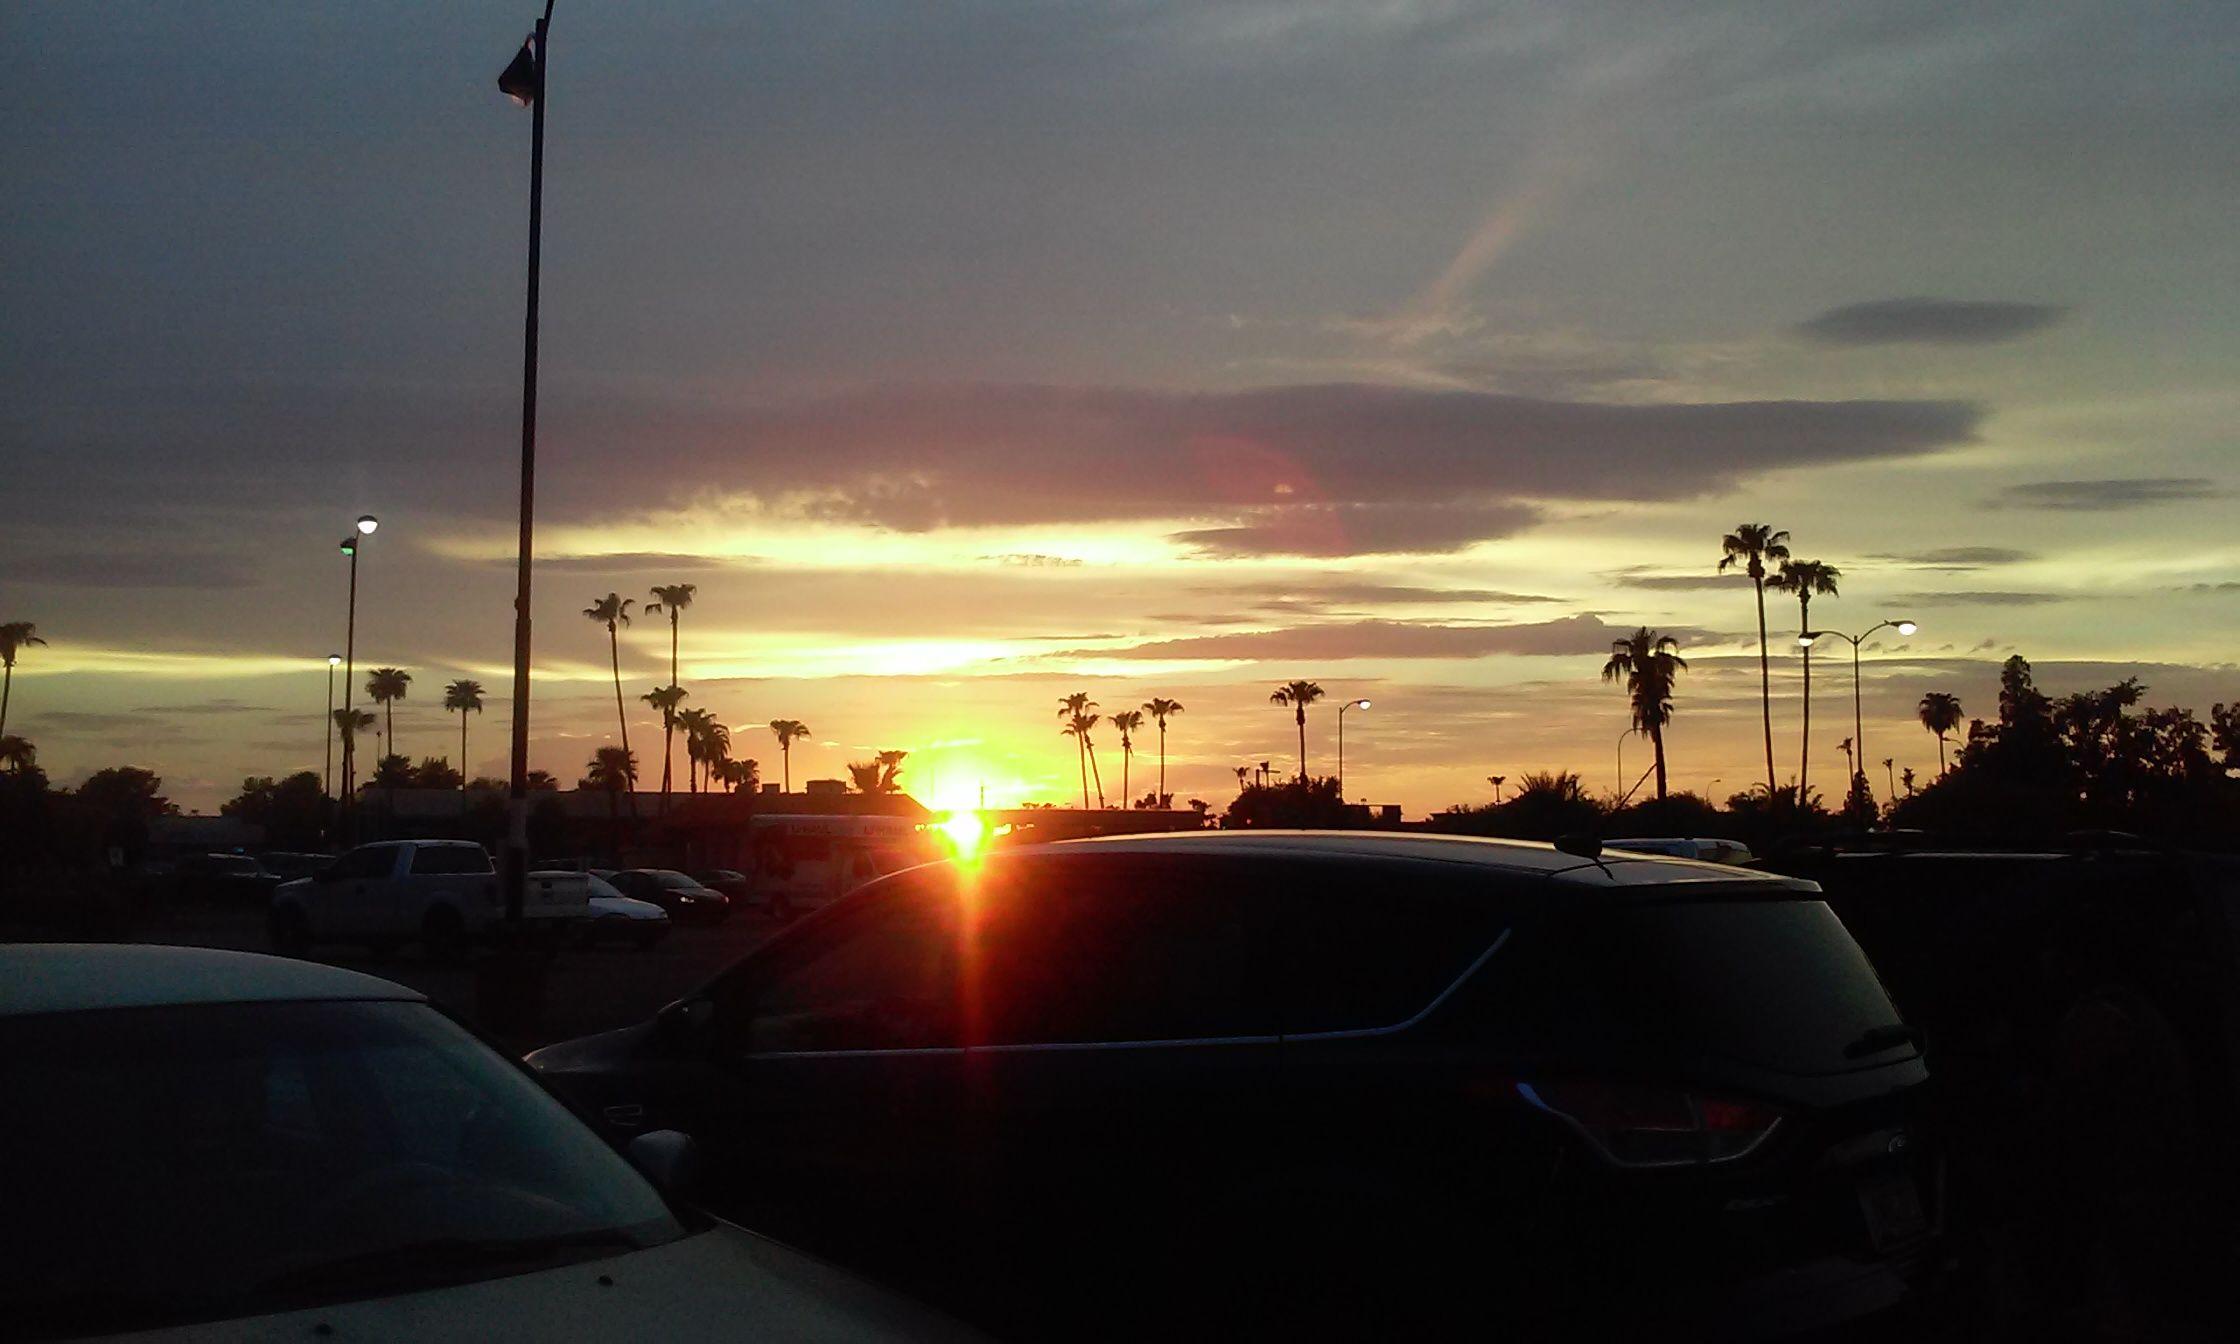 Sunset. -VP